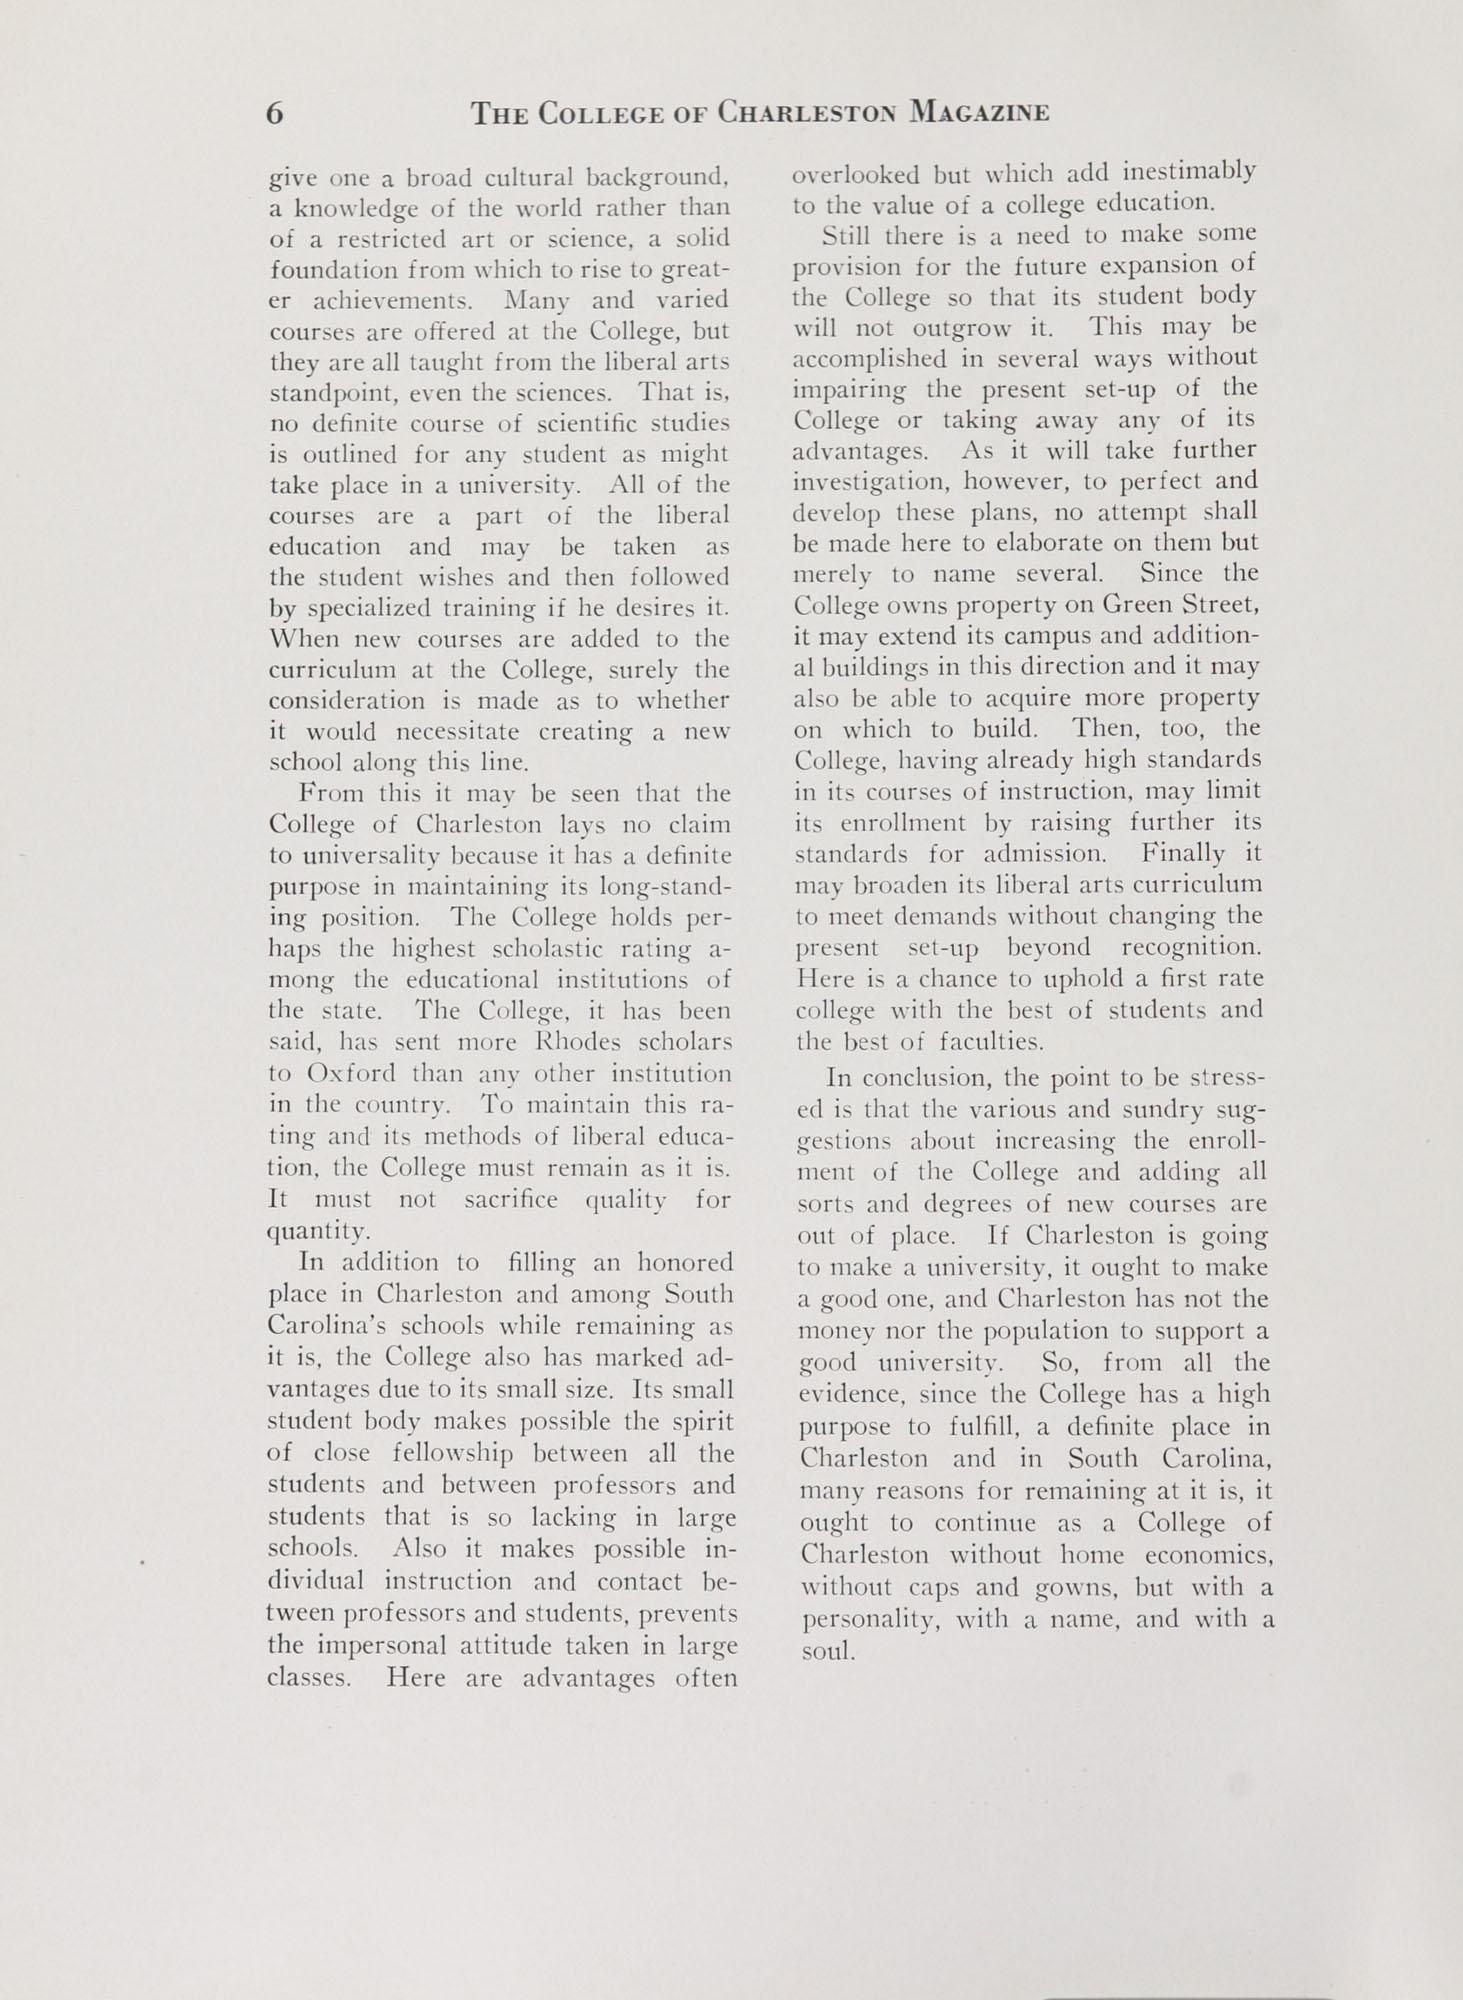 College of Charleston Magazine, 1938-1939, Vol. XXXXII No. 1, page 6